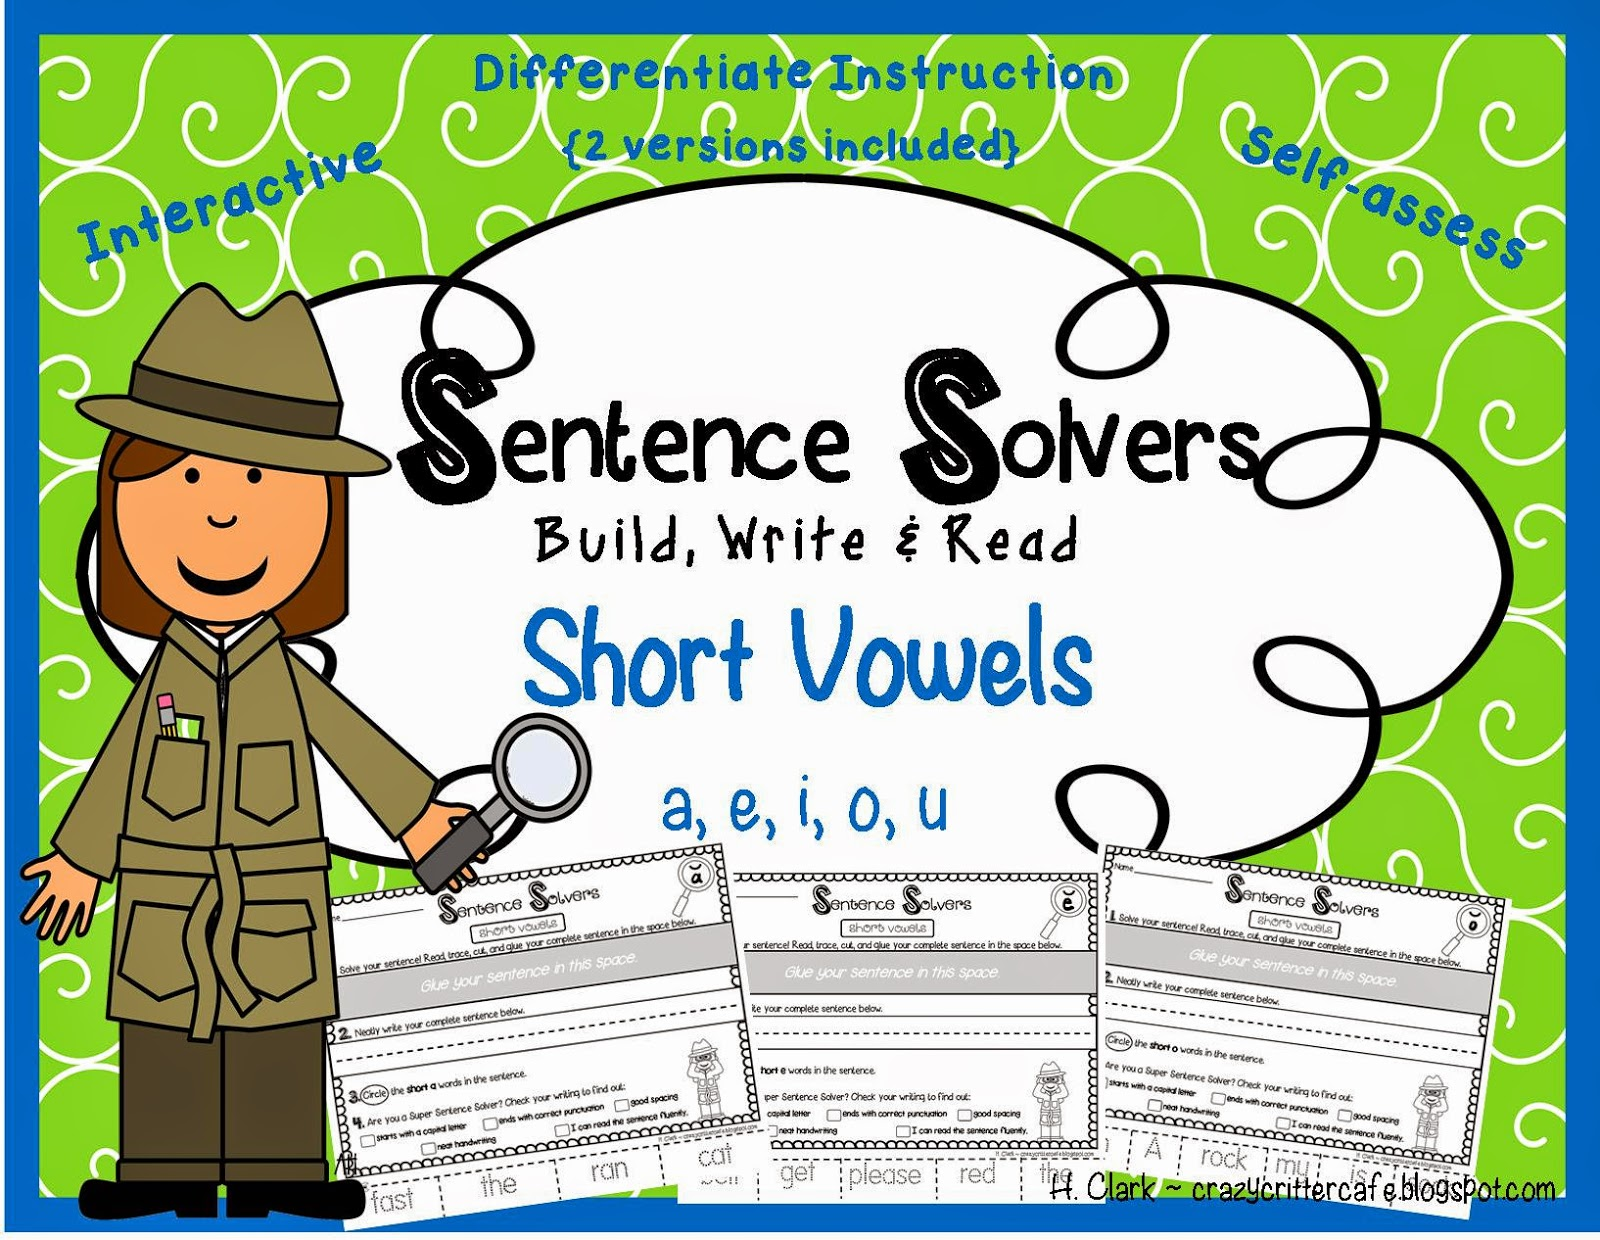 http://www.teacherspayteachers.com/Product/Sentence-Solvers-Short-Vowels-Interactive-Sentence-Building-Activity-1306356